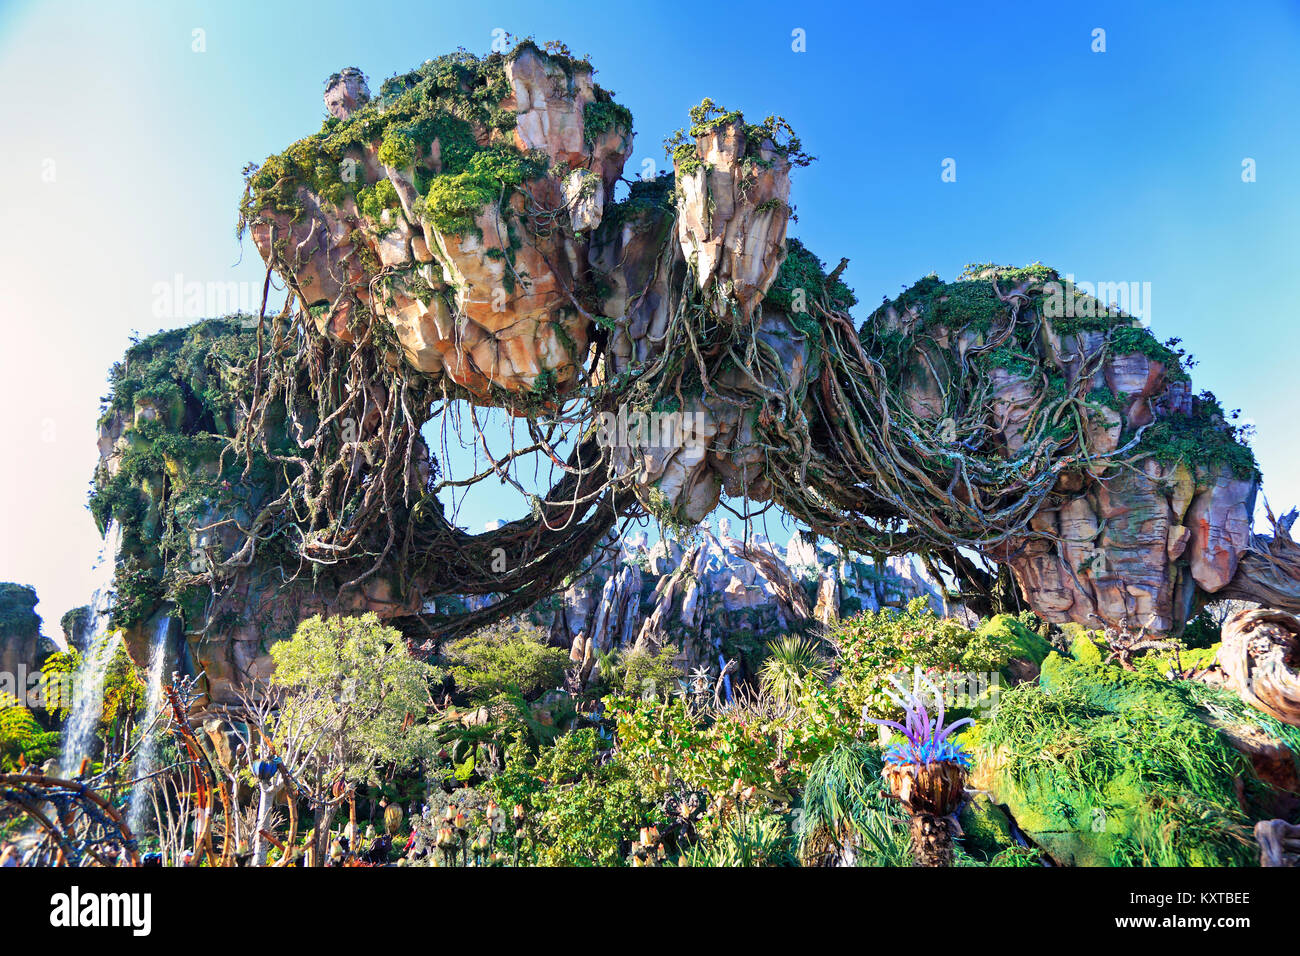 Montagne flottante in Pandora, Avatar Land, Regno Animale, Walt Disney World, a Orlando, Florida Immagini Stock